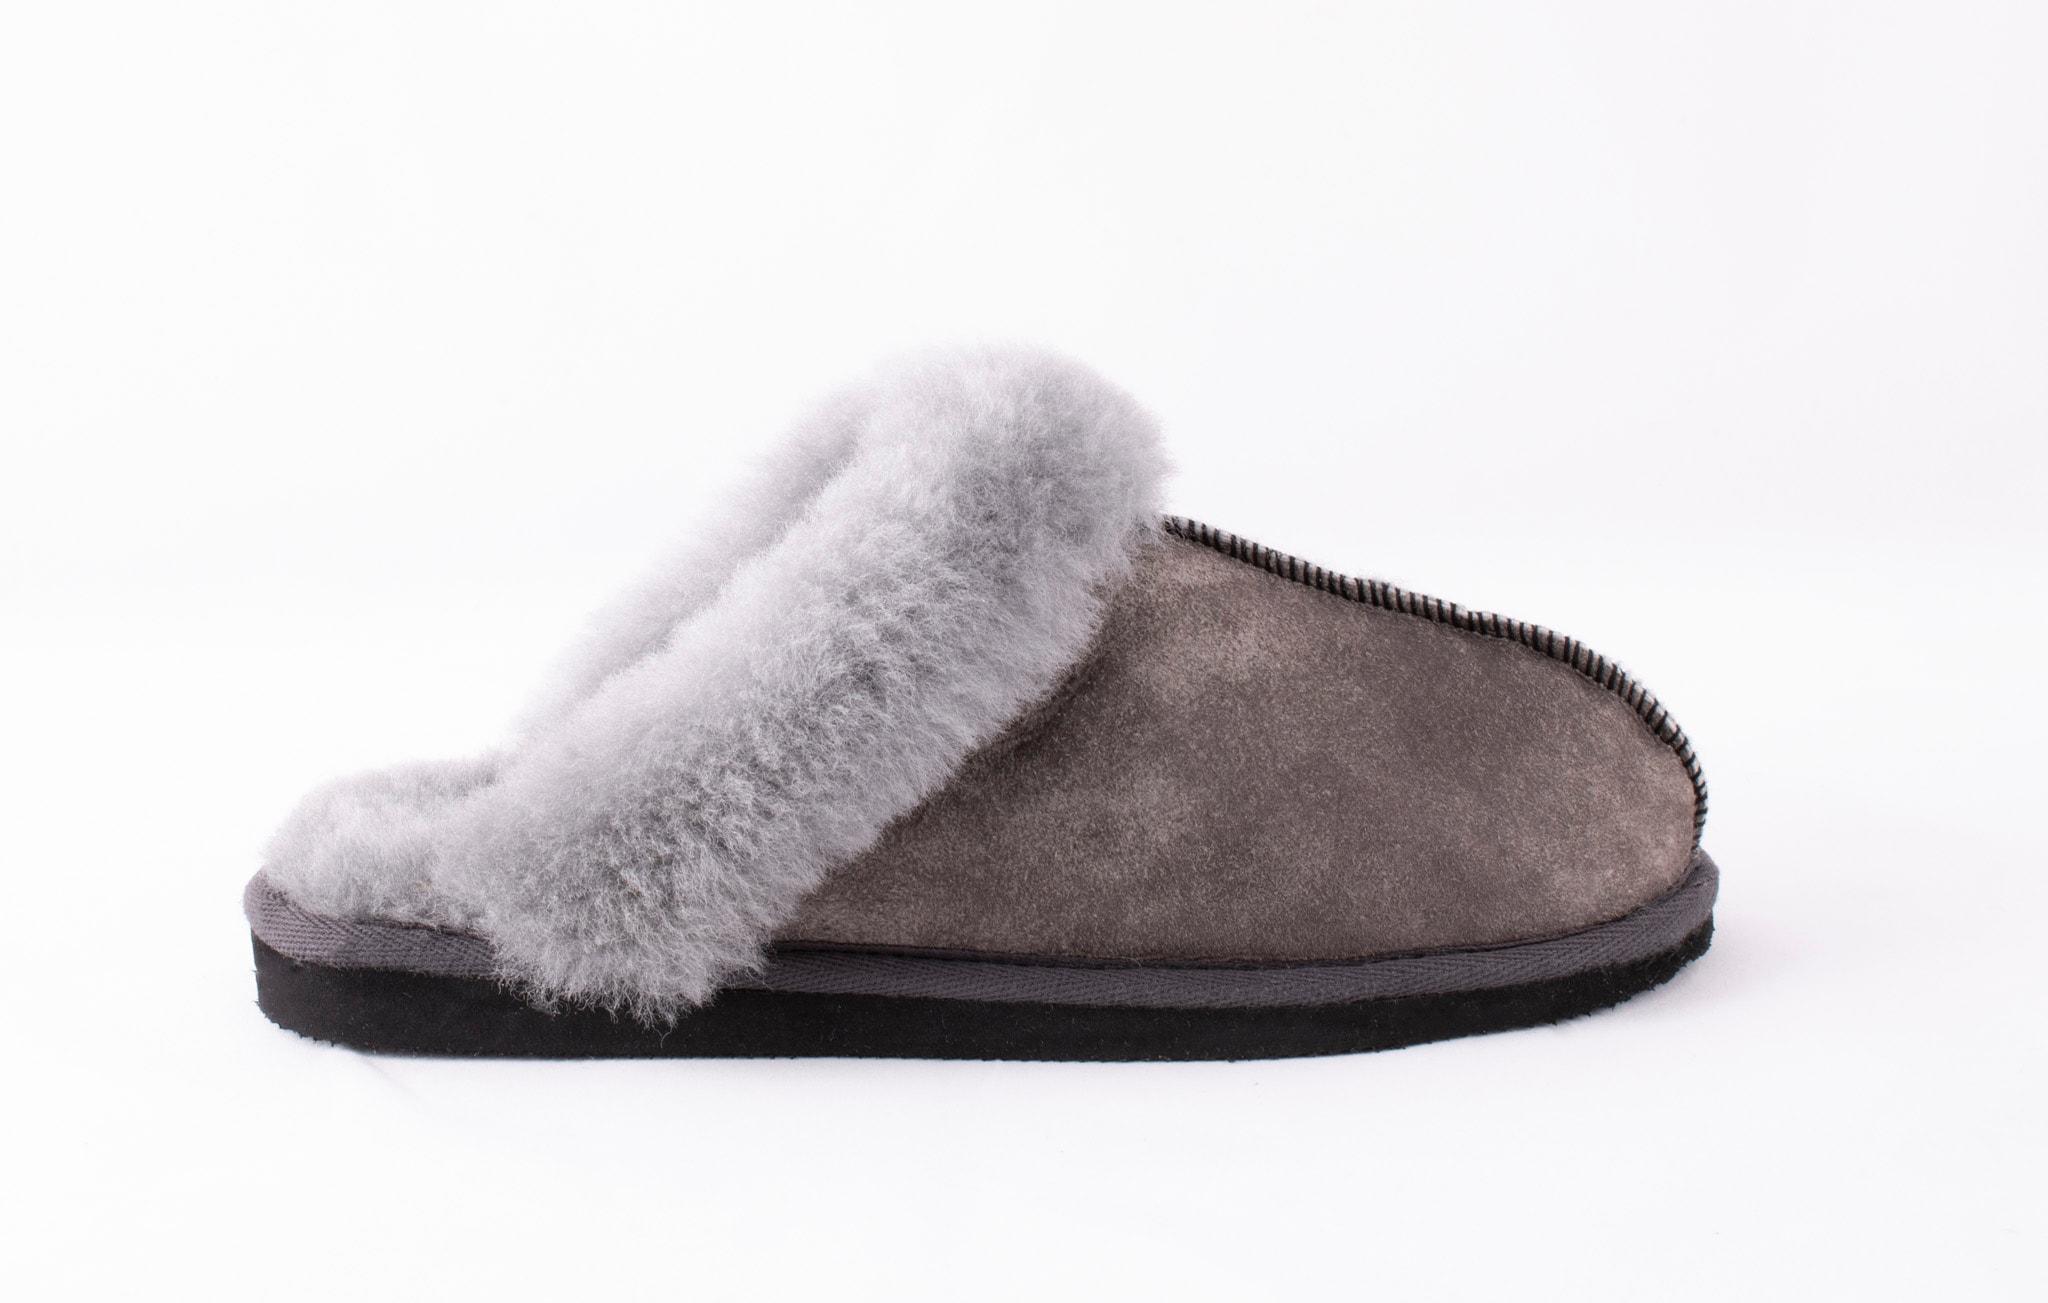 Shepherd Jessica slippers